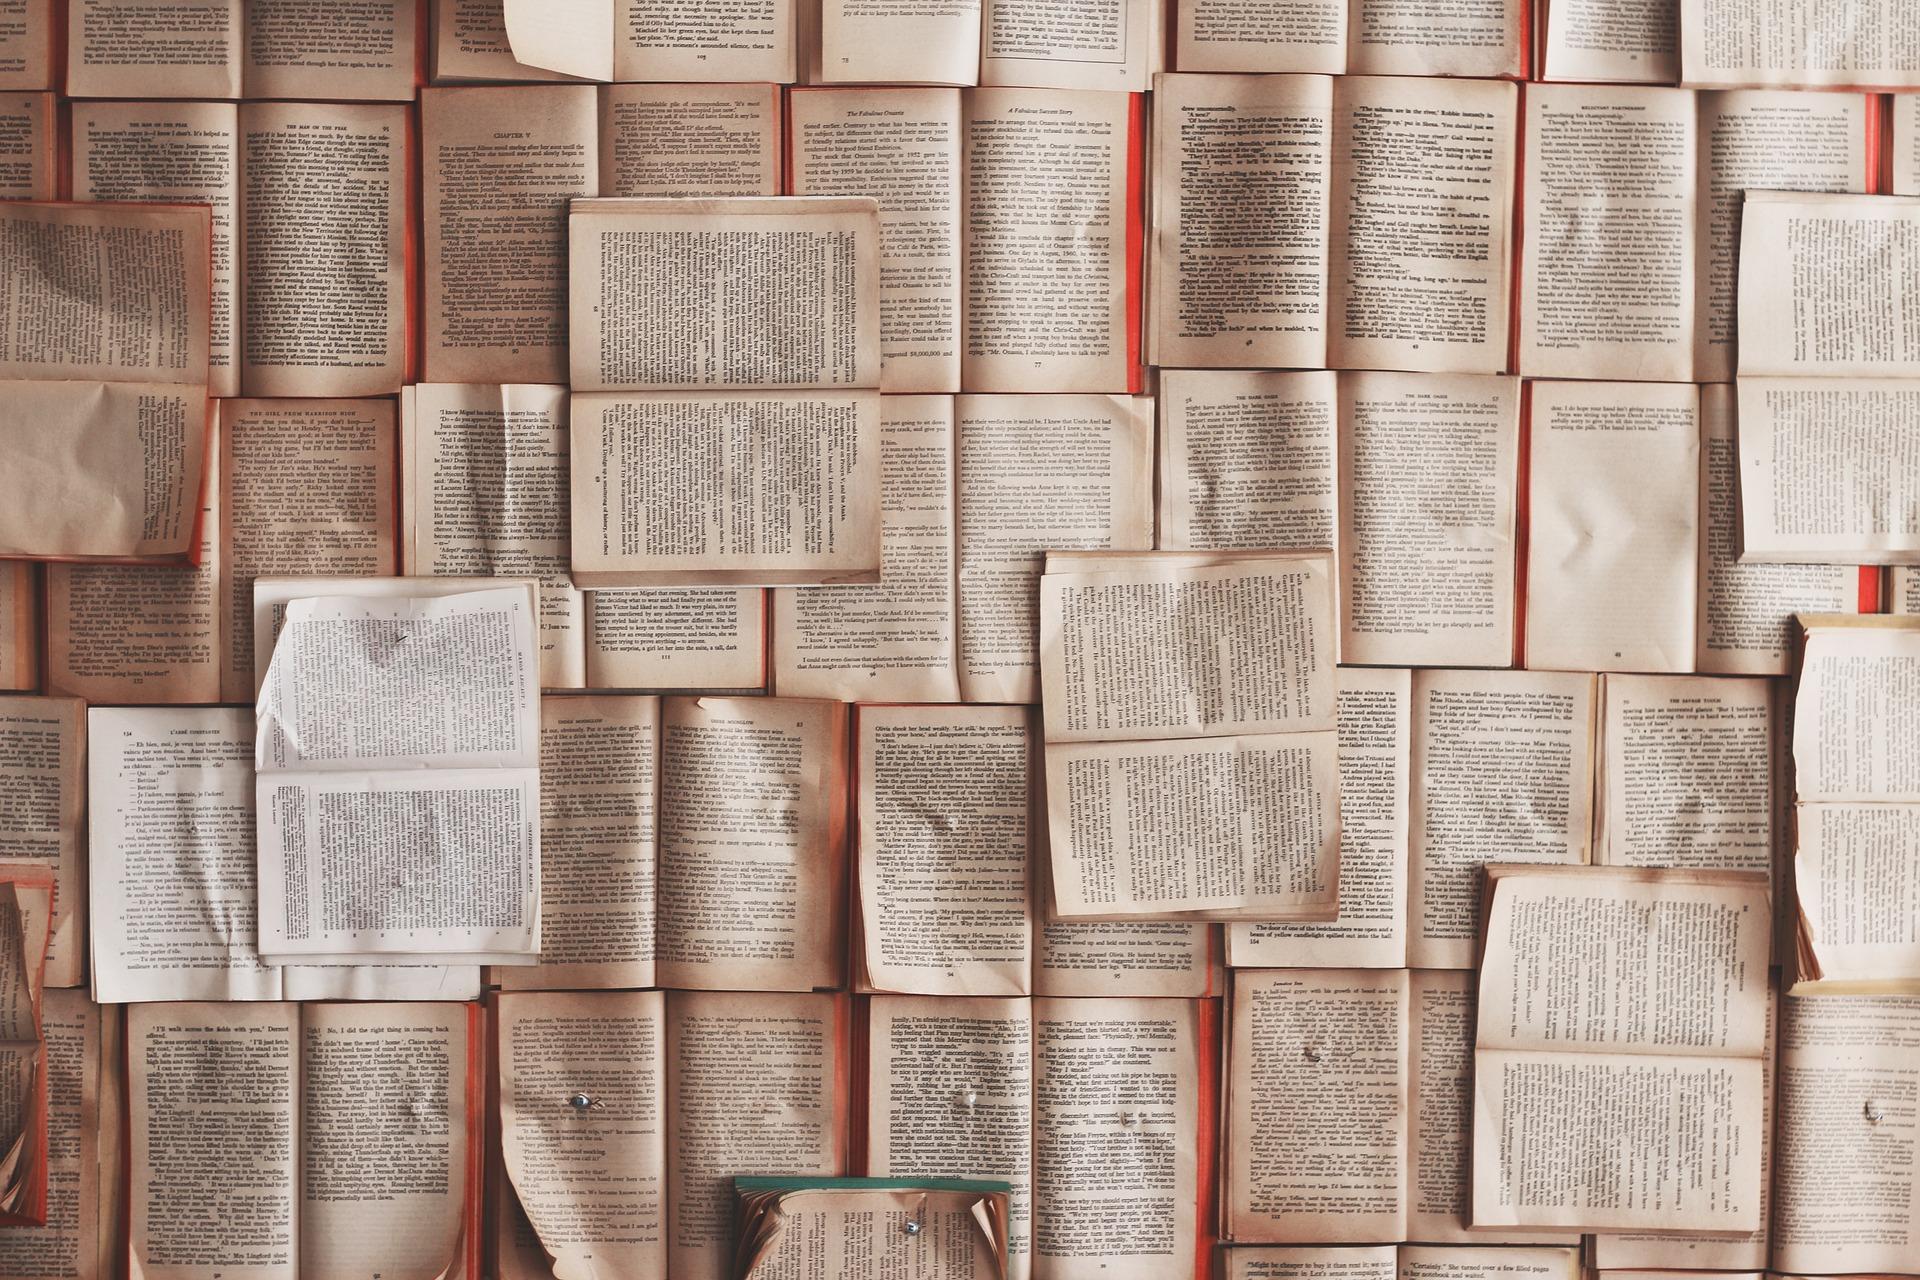 a few dozen open books arranged to cover a surface